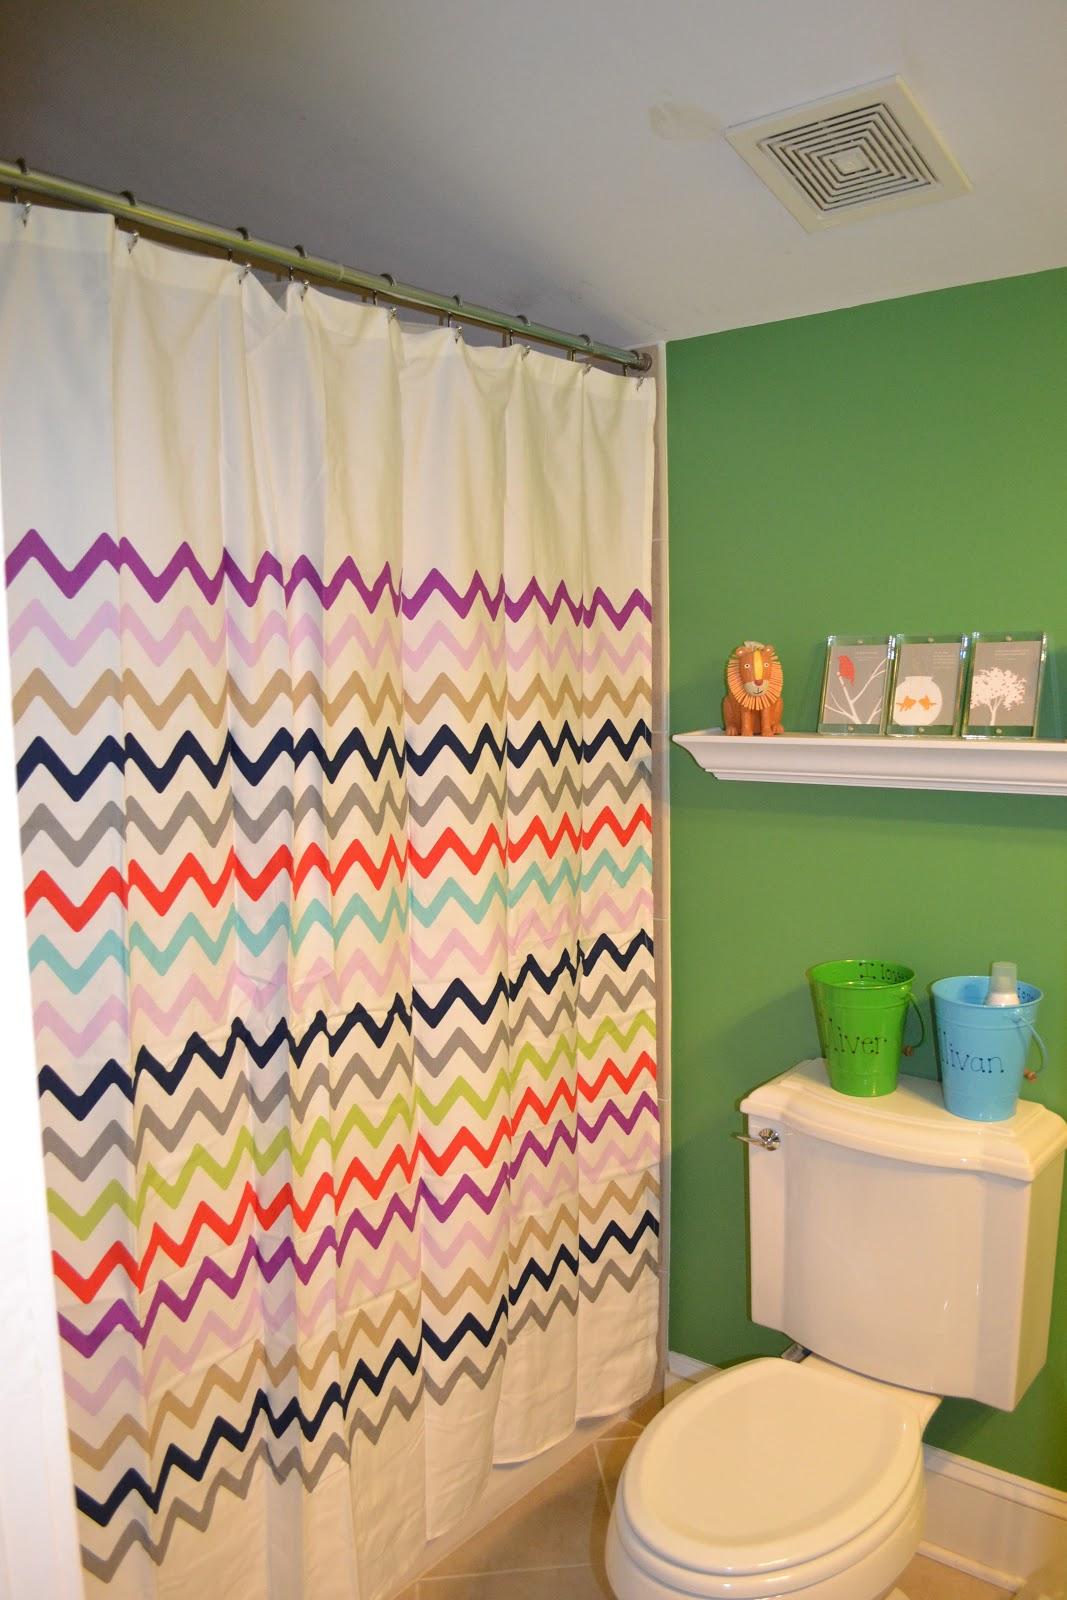 Merveilleux My House: Boy/girl Bathroom